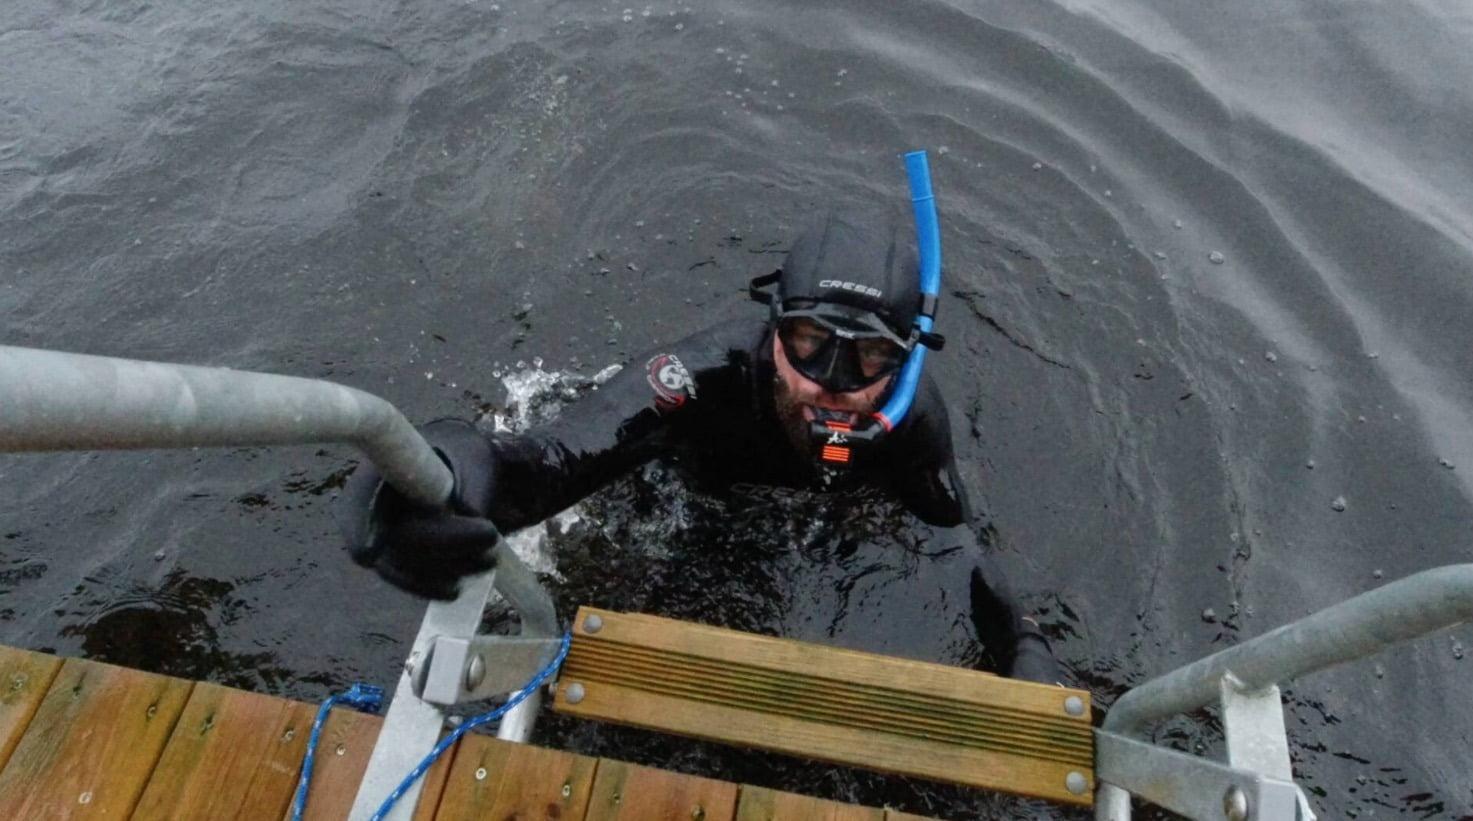 Buoyancy compensator, Scuba diving, Outdoor recreation, Water, Vertebrate, Divemaster, Fluid